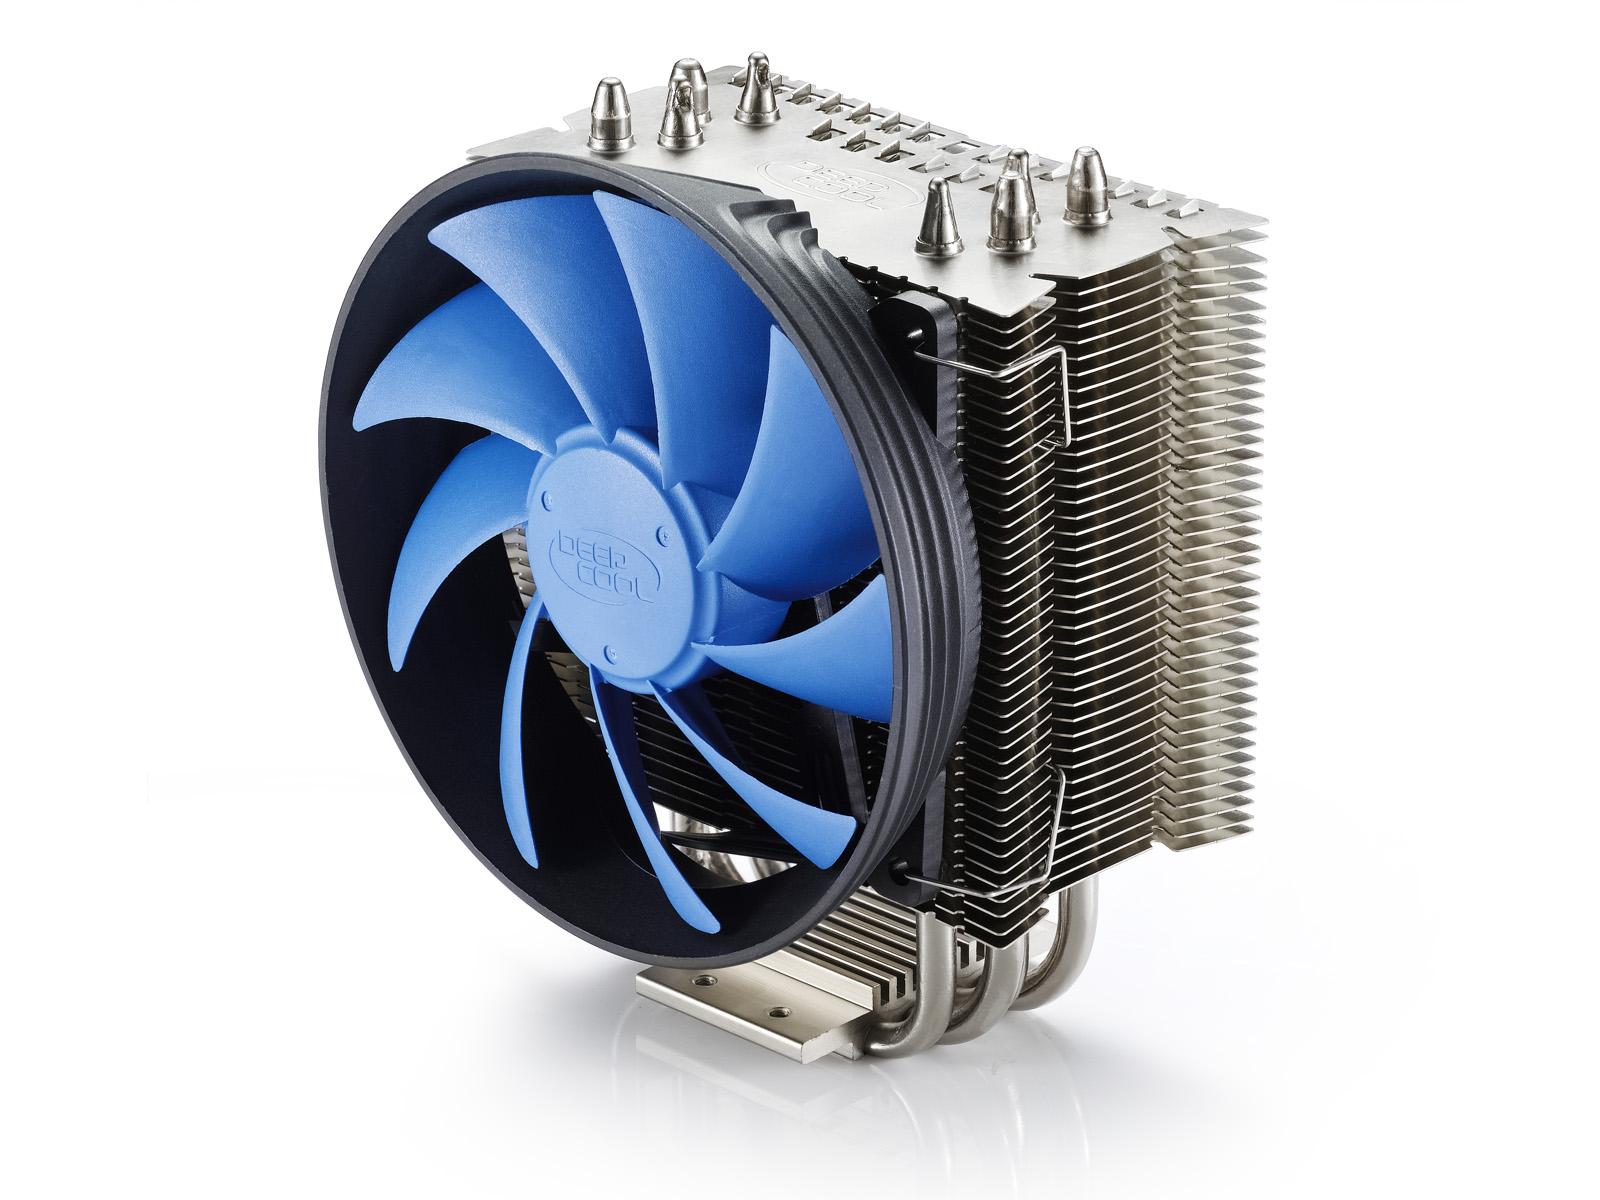 GAMMAXX S40. Производитель: DeepCool, артикул: 0225607